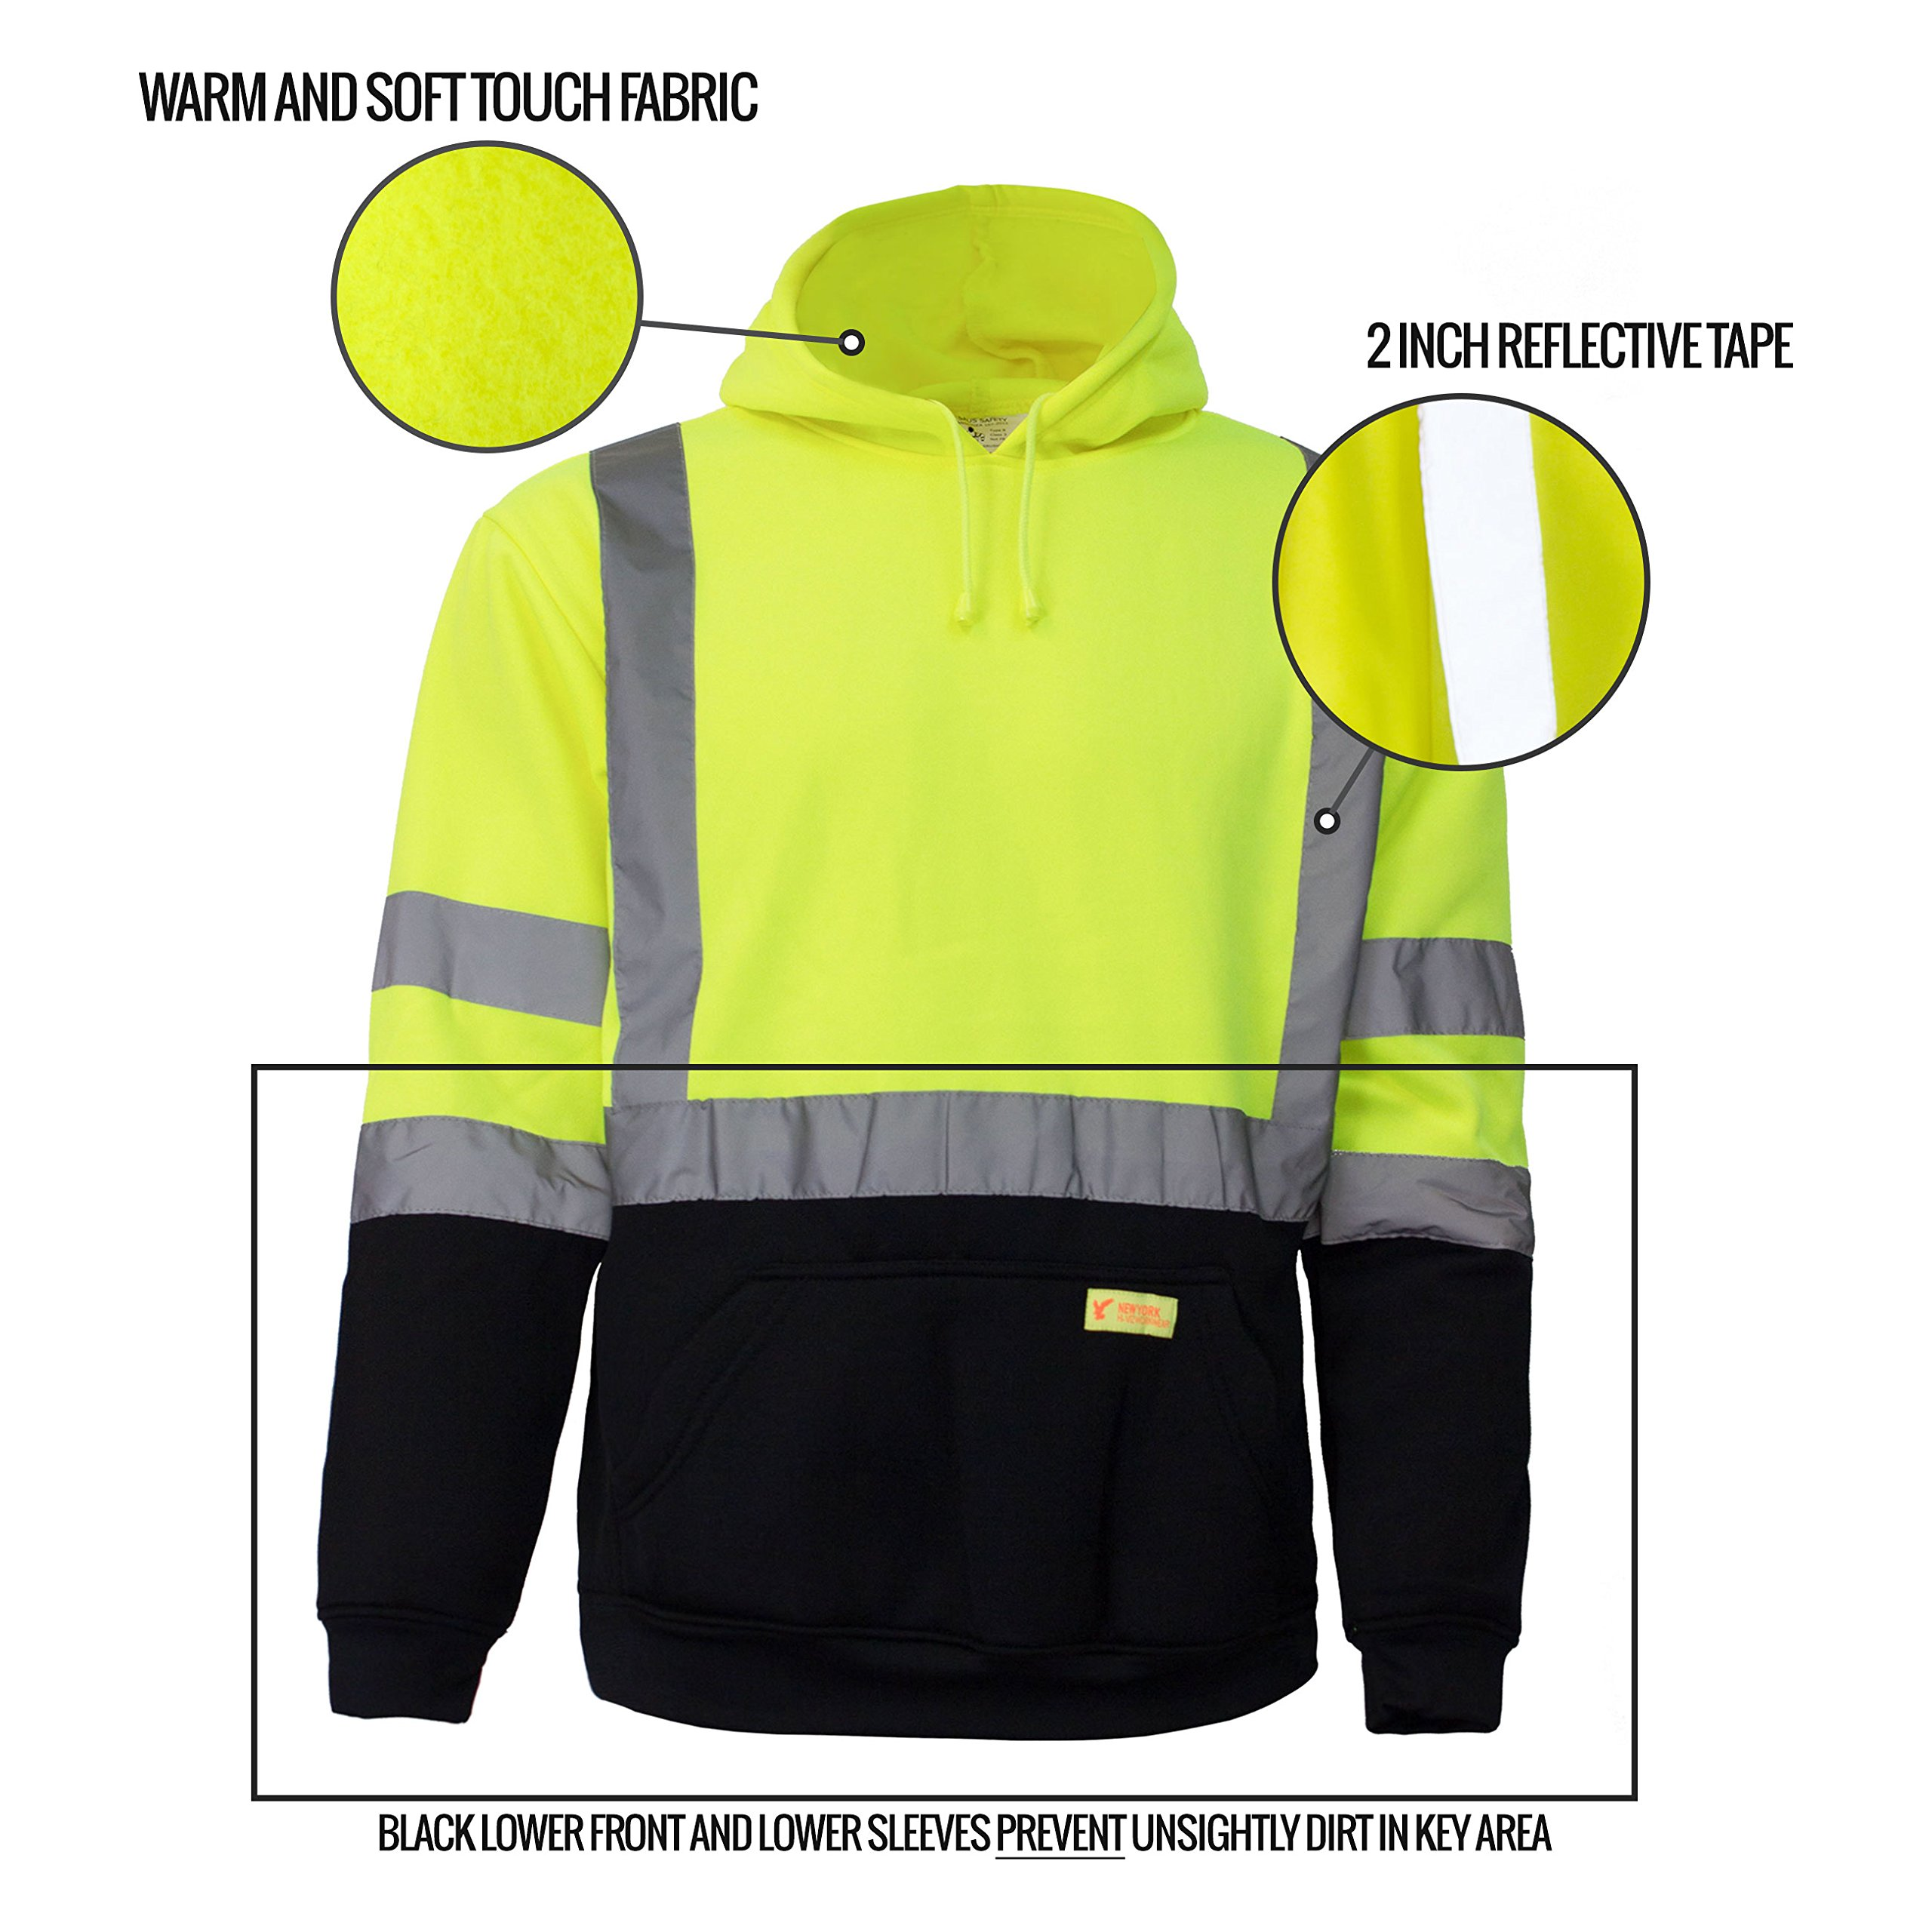 New York Hi-Viz Workwear H8312 Men's ANSI Class 3 High Visibility Class 3 Sweatshirt, Hooded Pullover, Knit Lining, Black Bottom (Lime, Large) by New York Hi-Viz Workwear (Image #6)